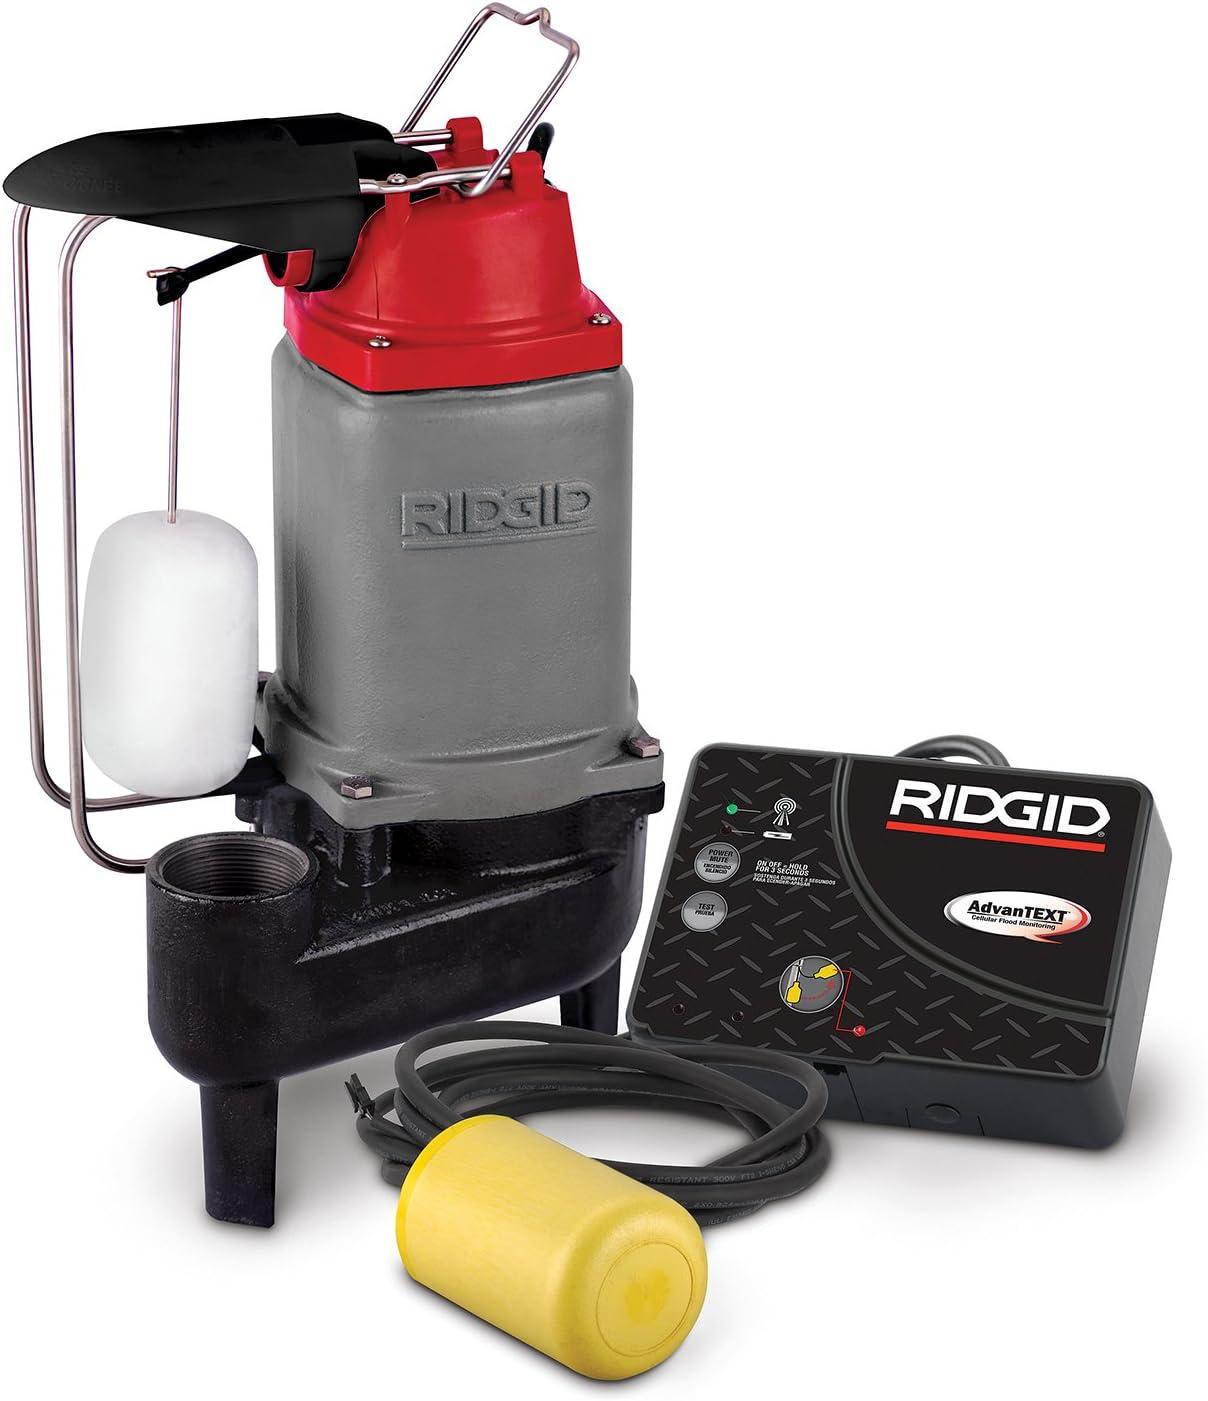 Ridgid 47288 RW50AT 1/2 HP Sewage Pump System with Advanced Cellular Flood Monitoring